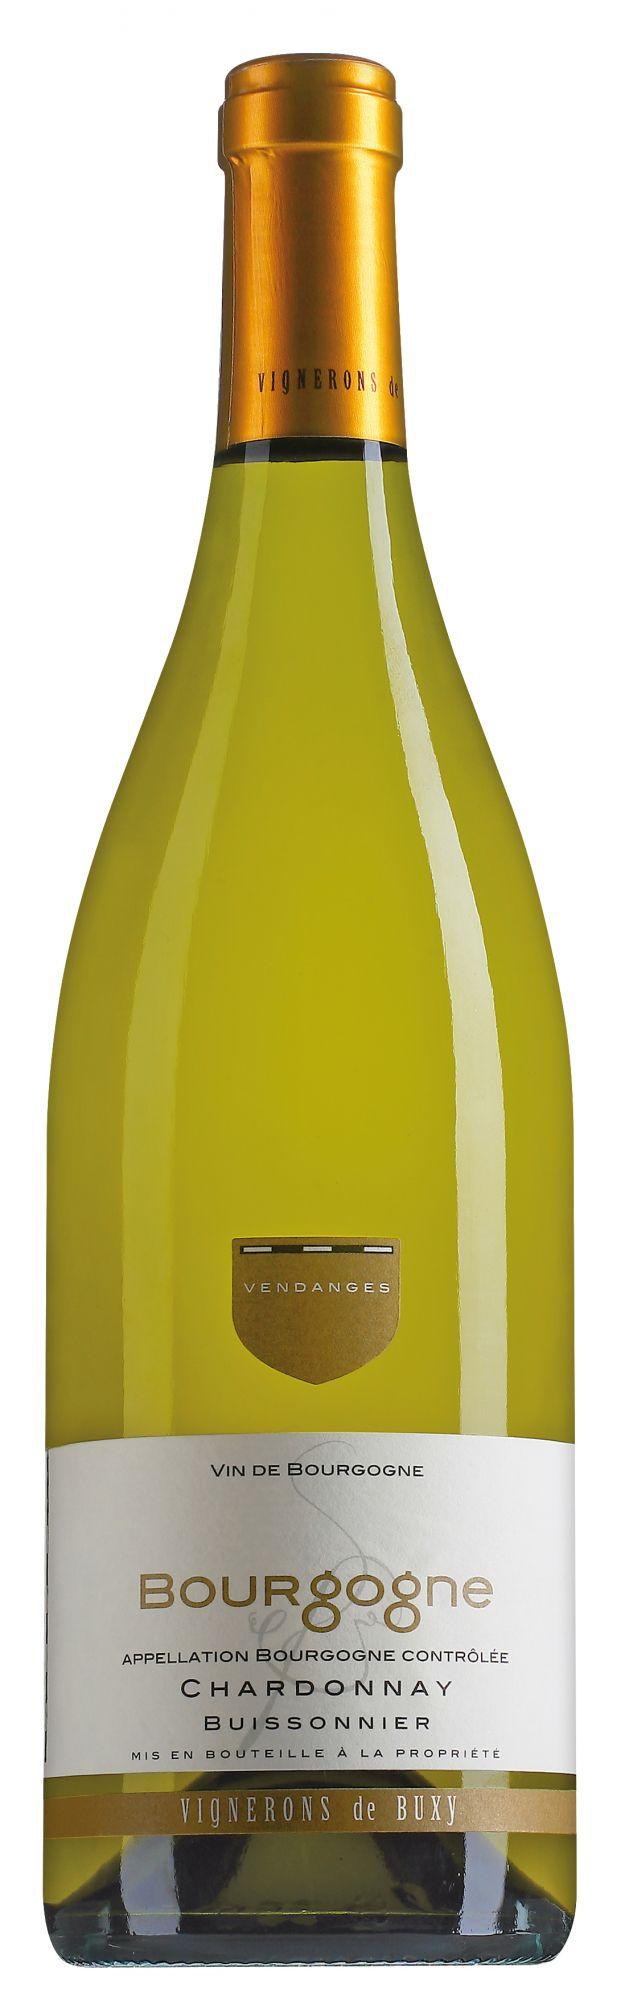 Buissonnier Bourgogne Chardonnay